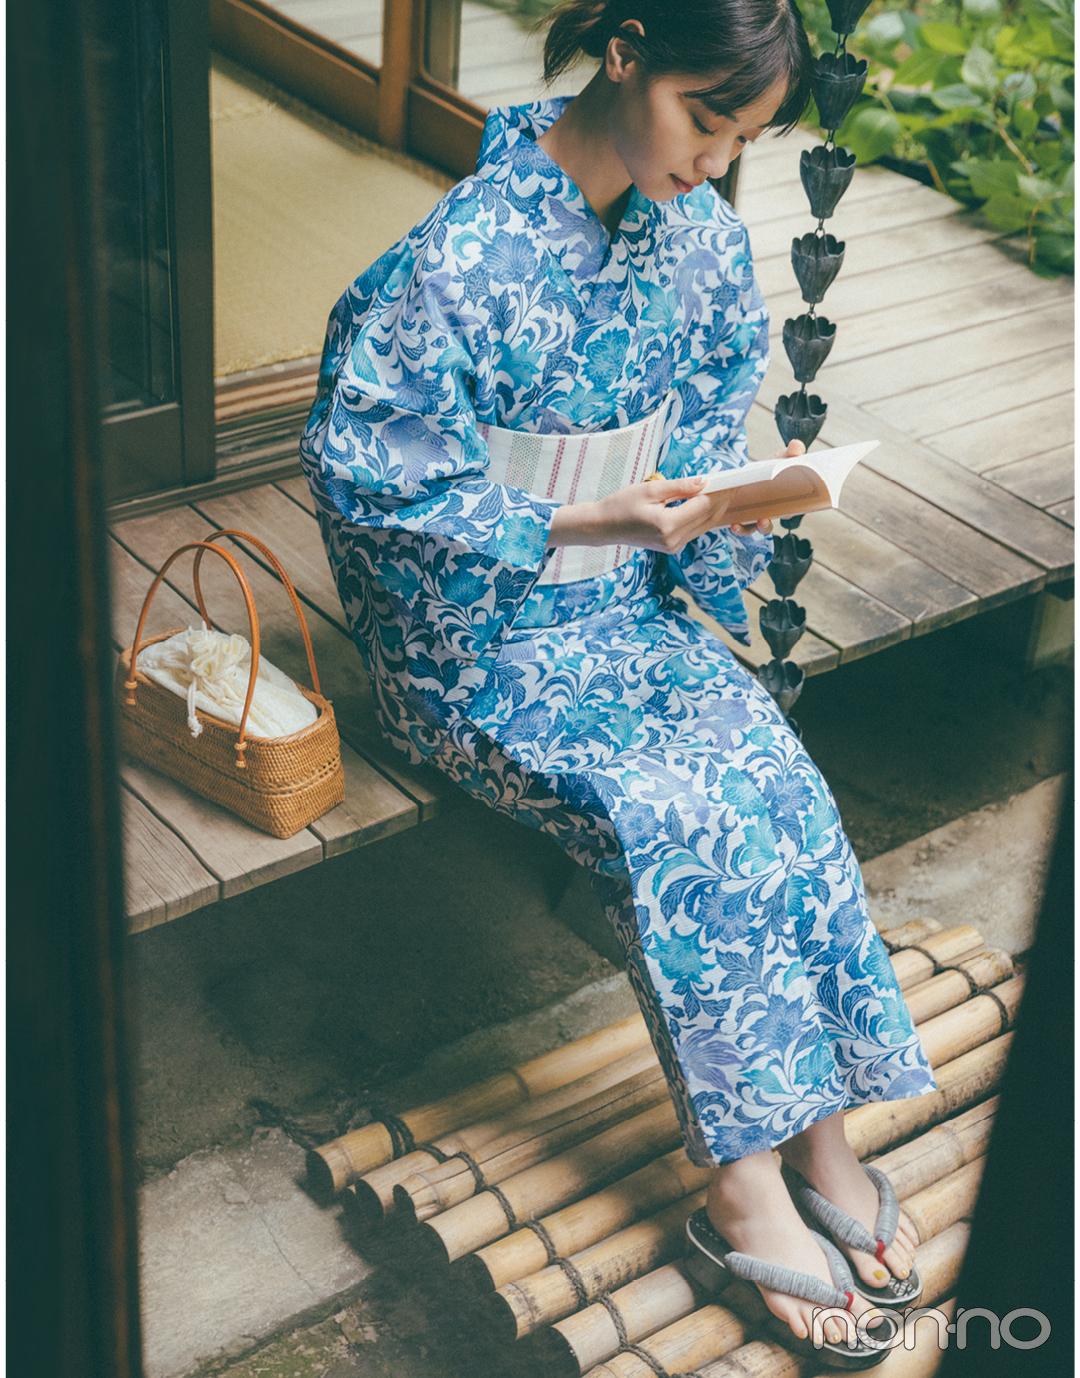 Photo Gallery 日常を特別に。西野七瀬の浴衣コレクション【2021版】_1_5